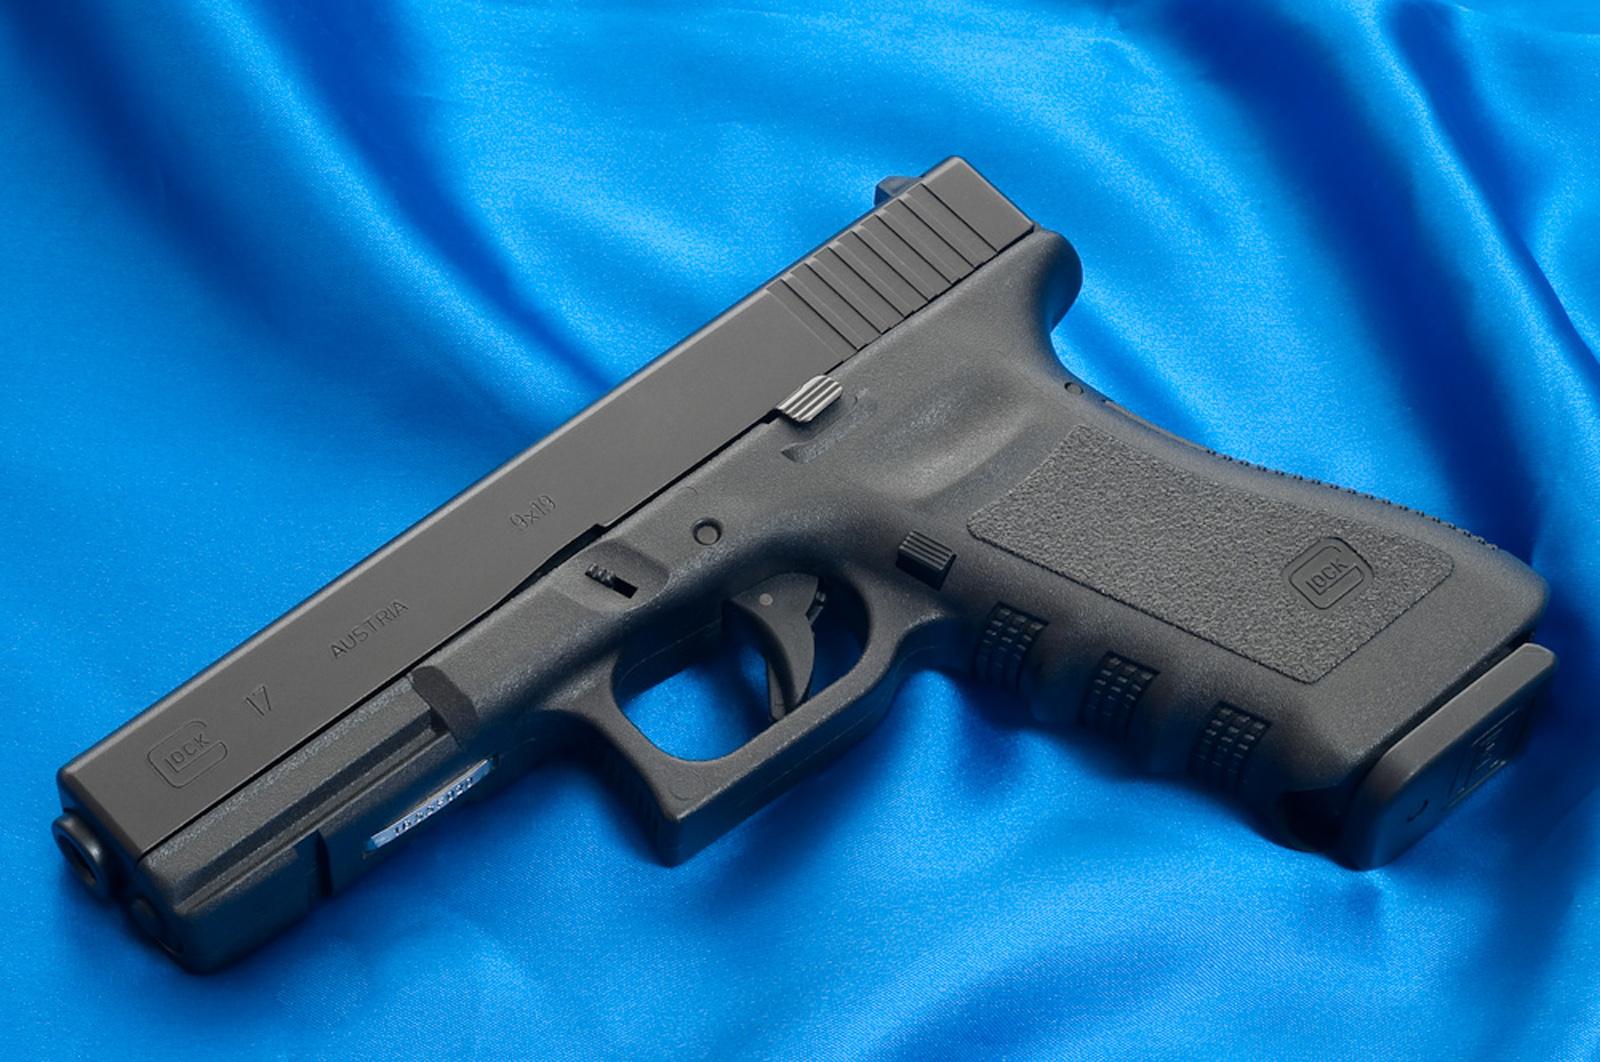 Glock 17 Photos HD Wallpapers Military WallBase 1600x1062